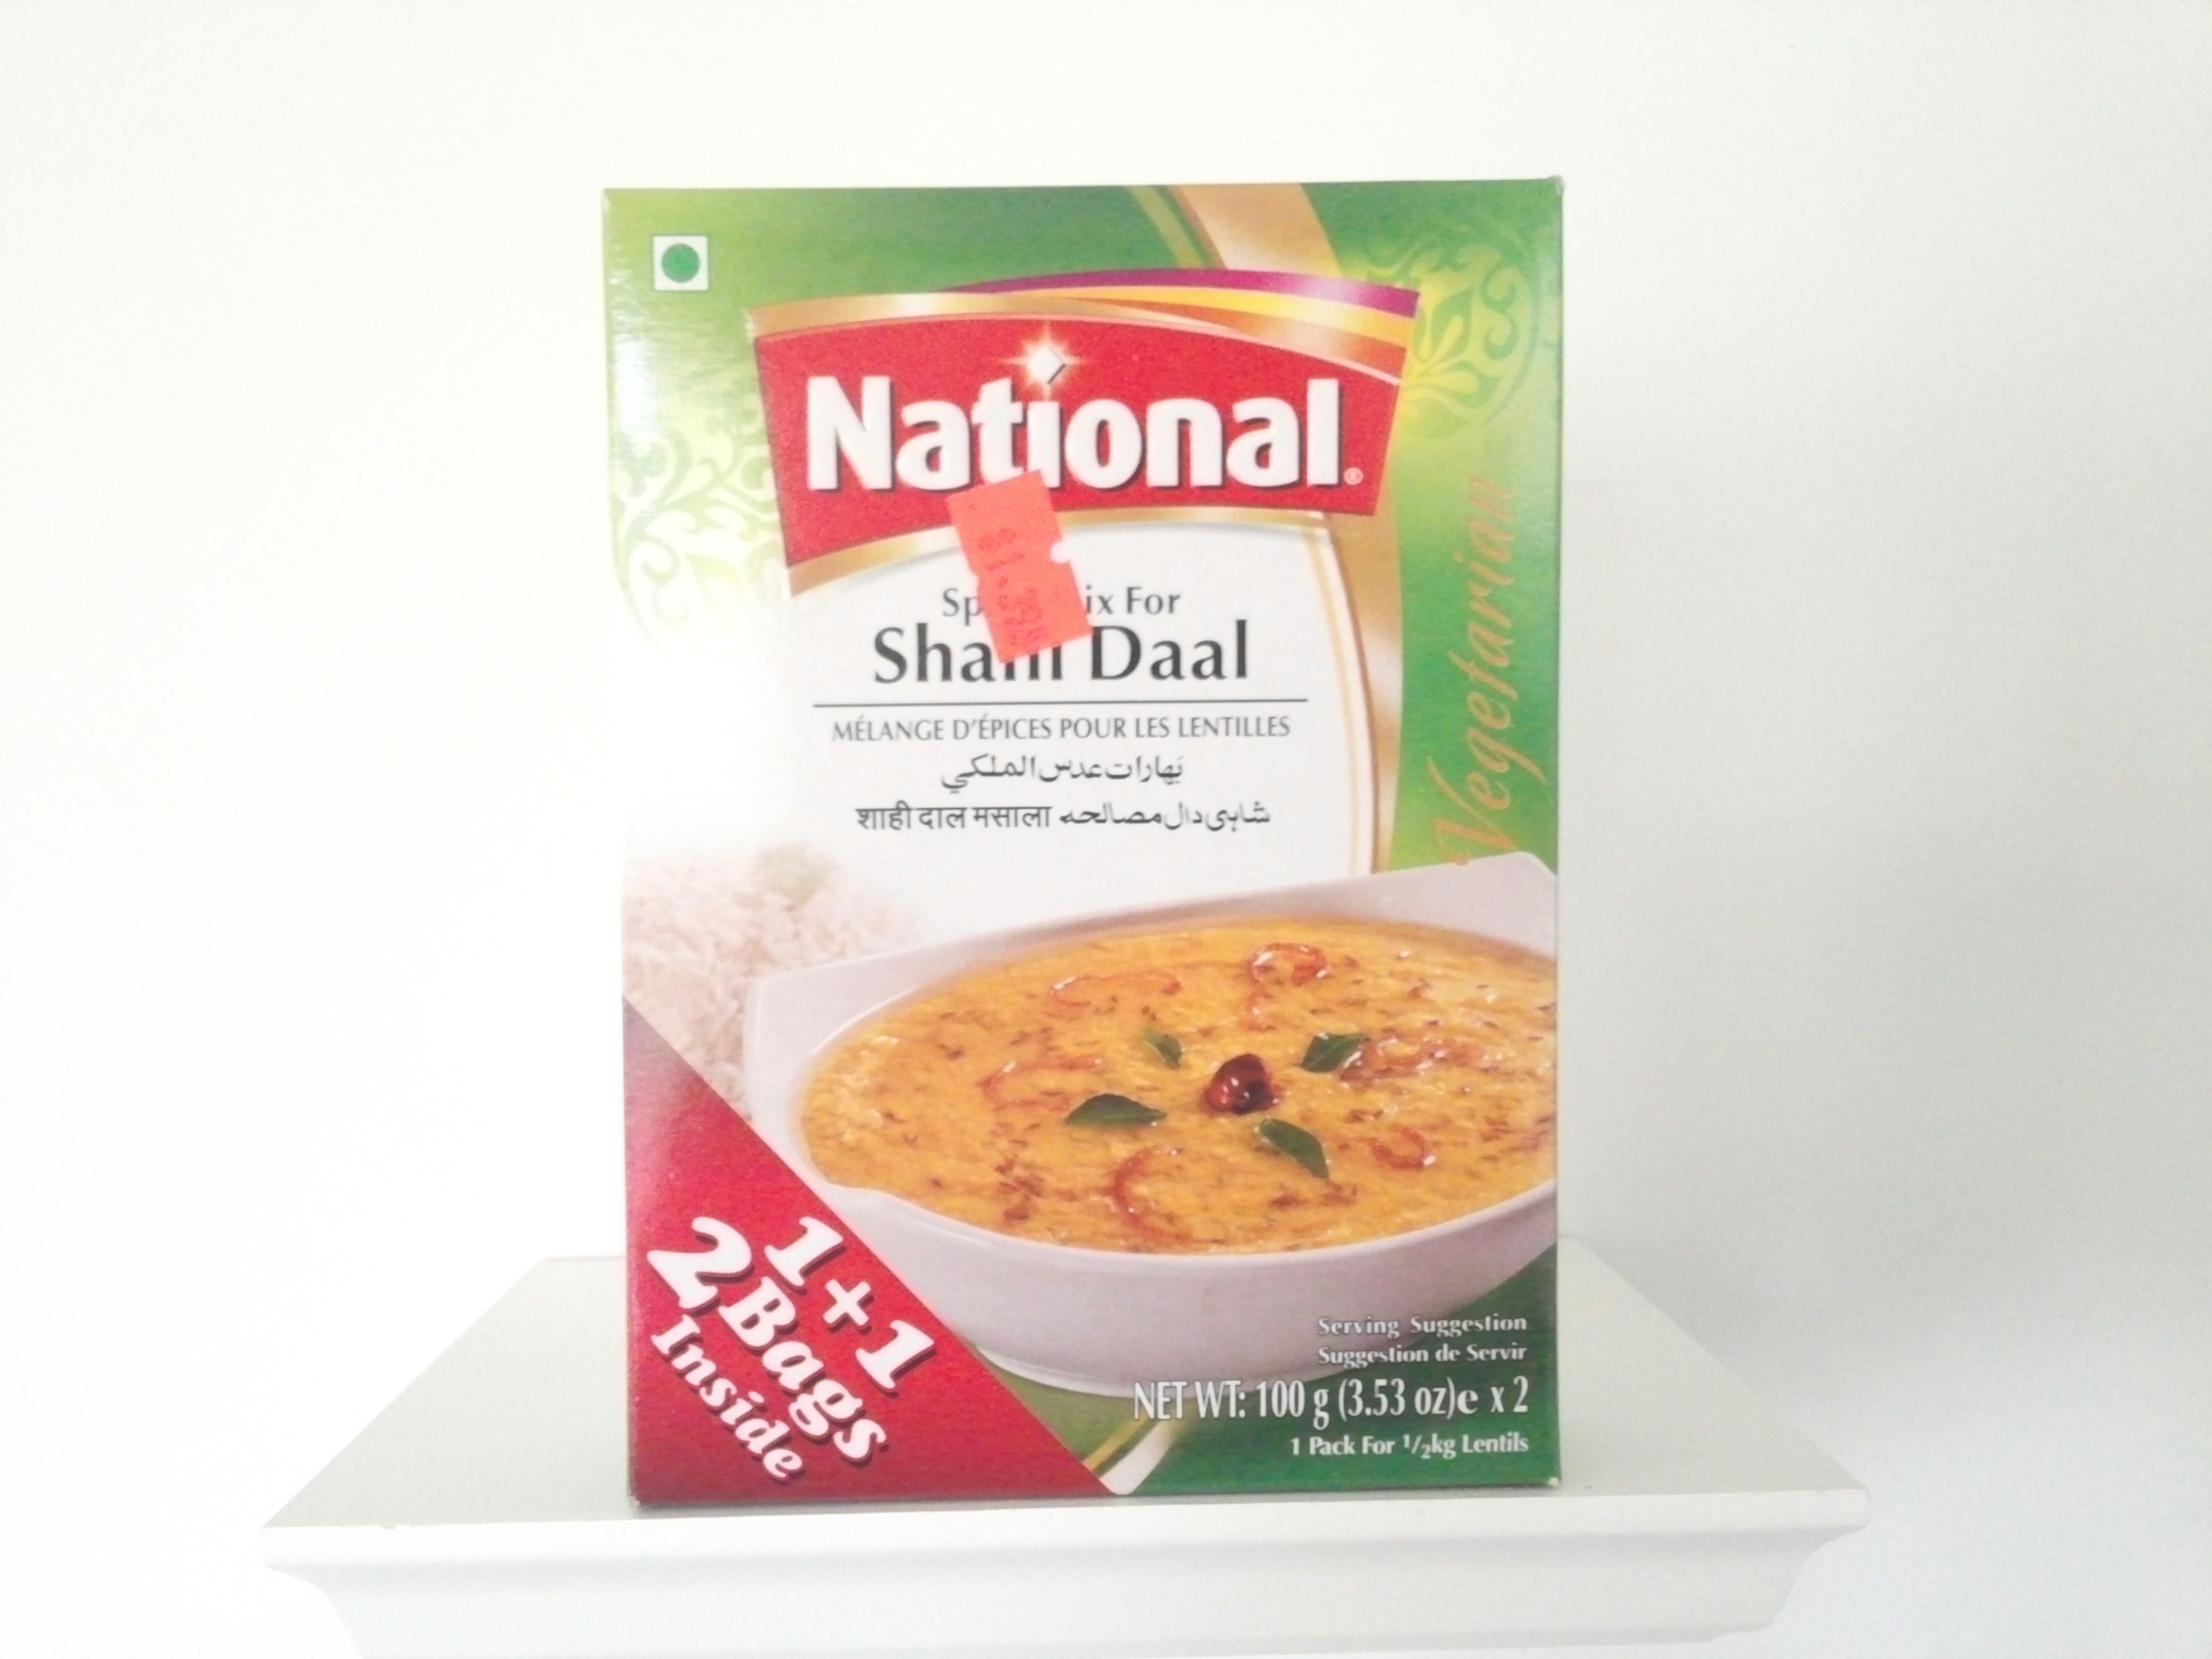 National Shahi Daal Spice Mix 200 grm